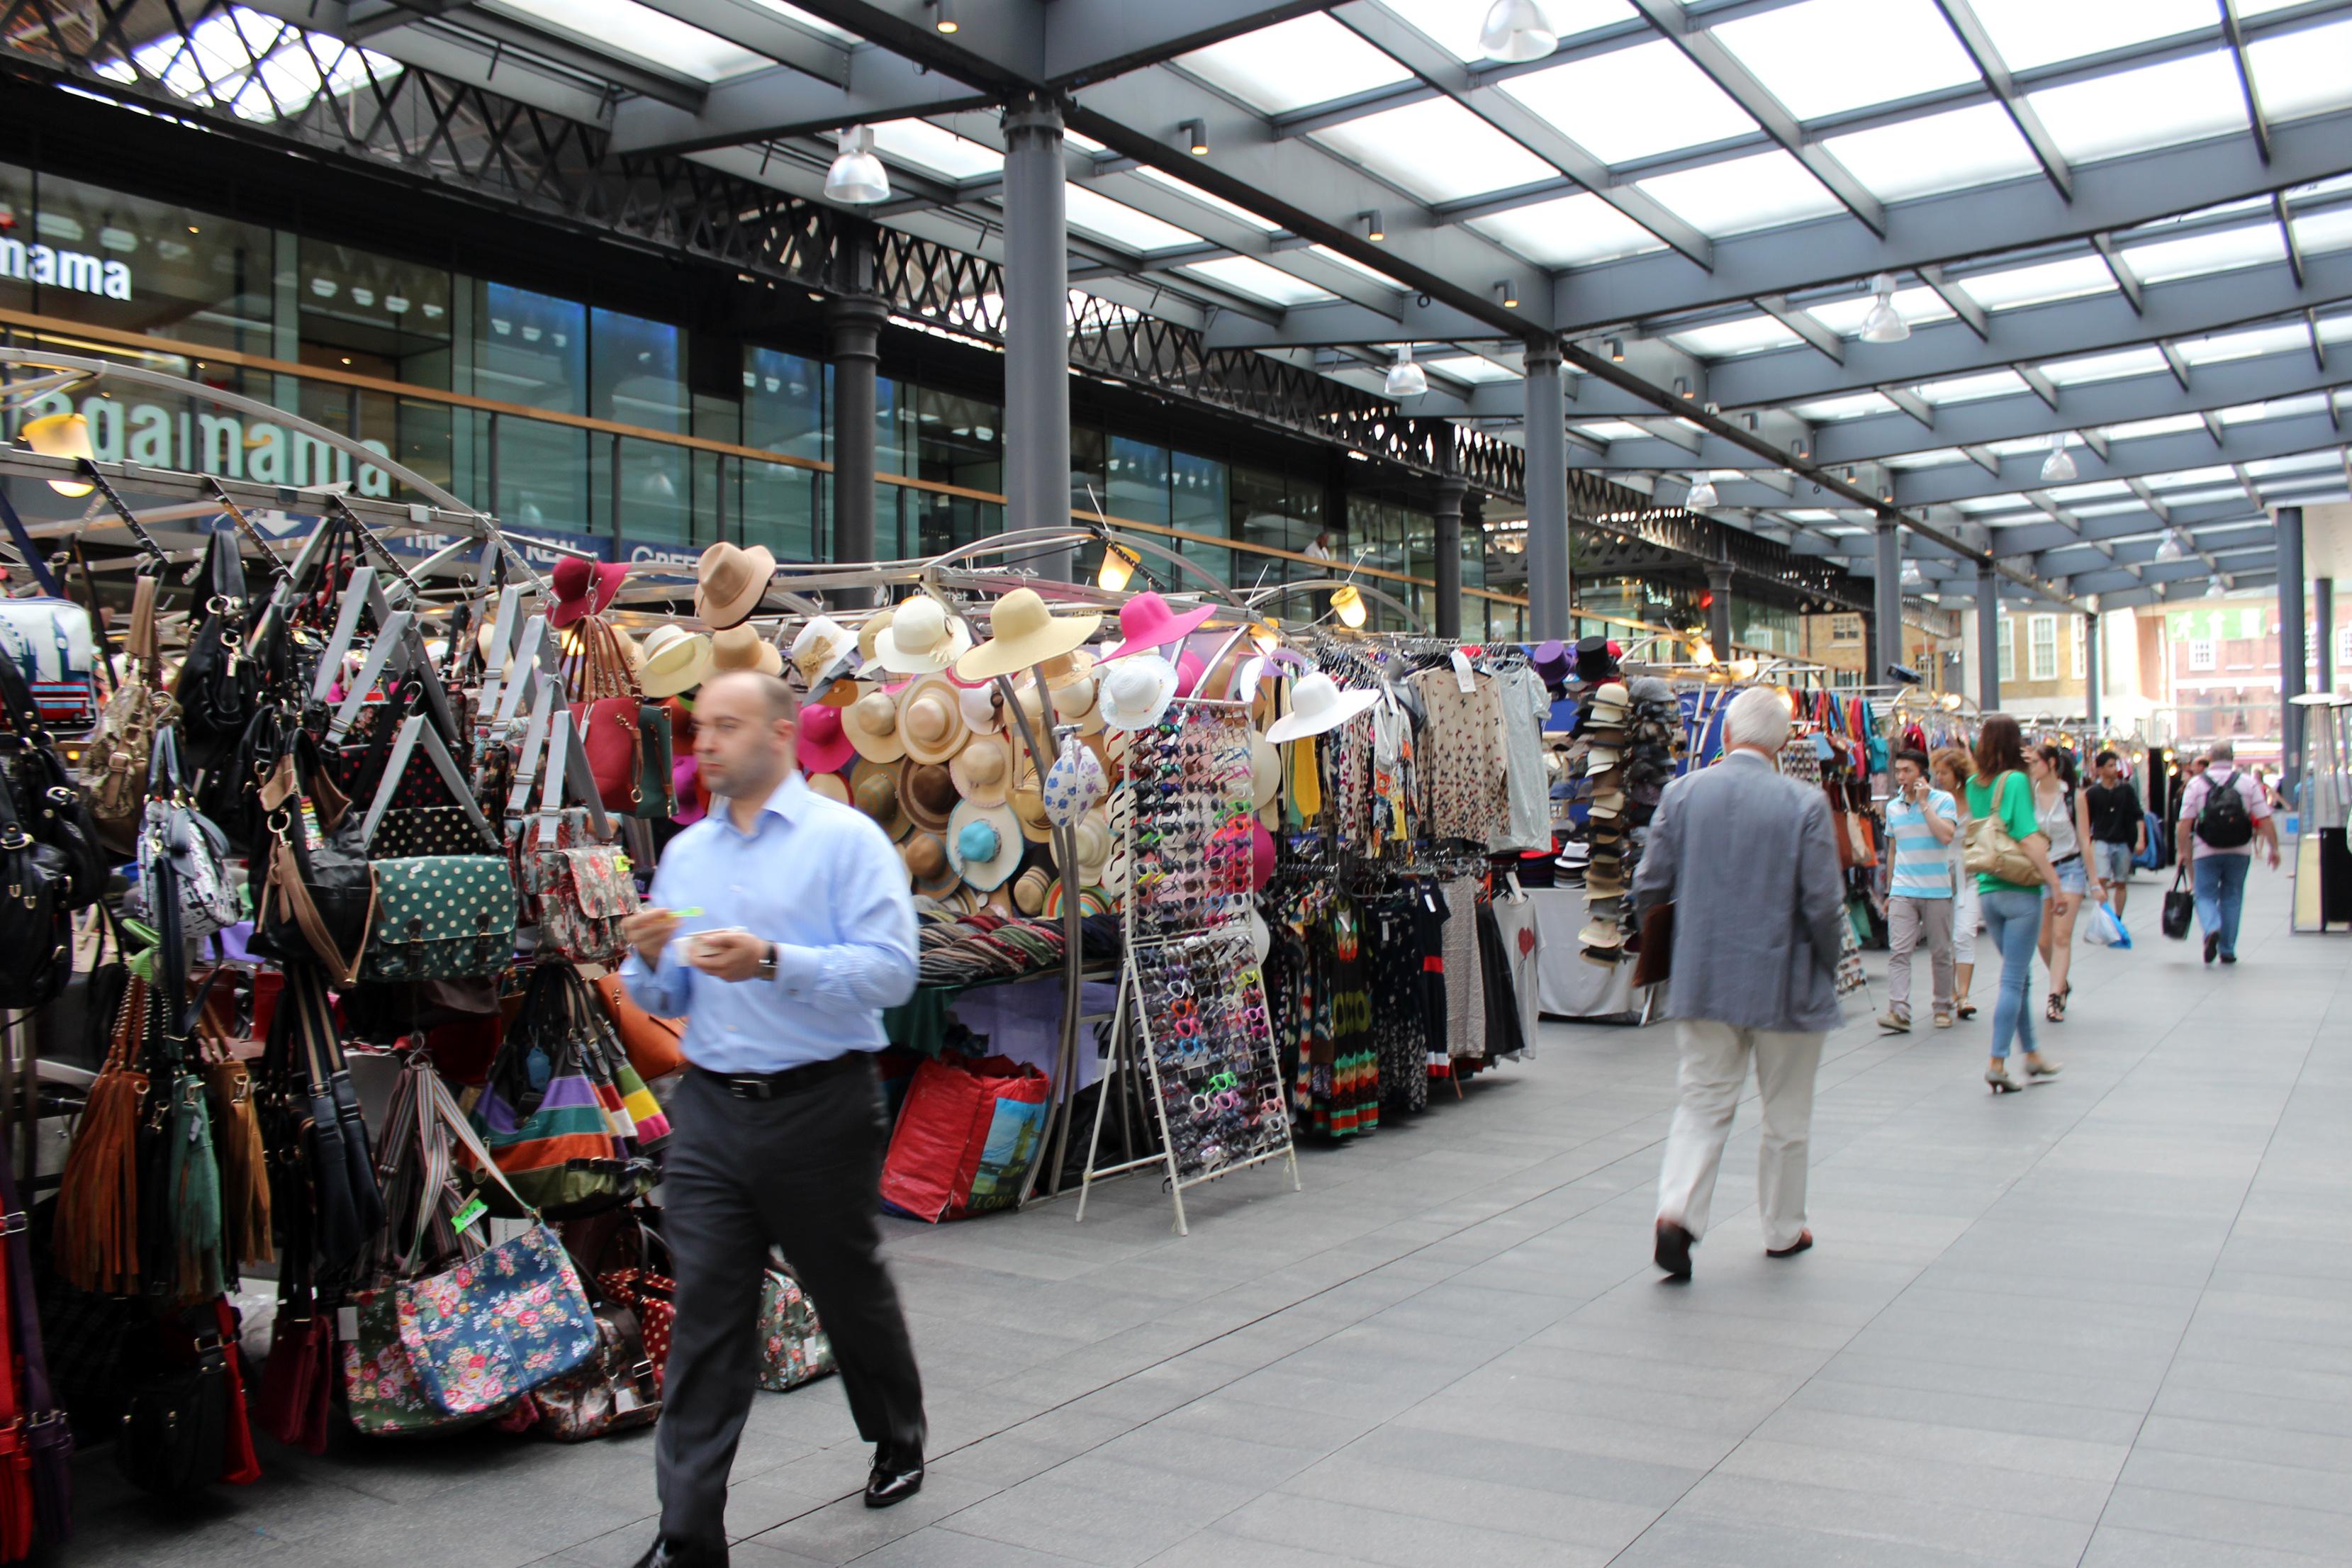 Spitalfields clothing stores